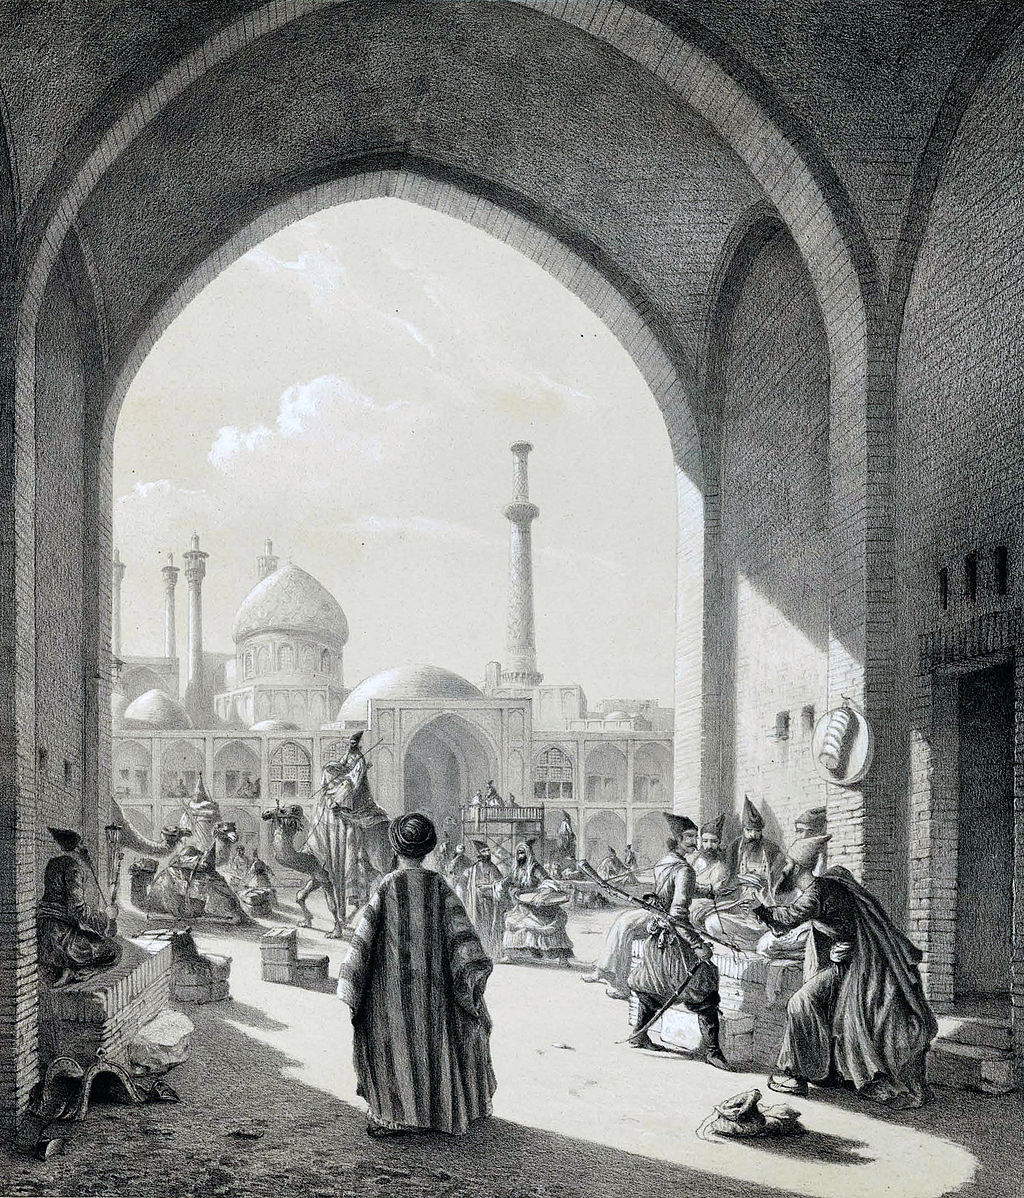 A_caravanserai_in_Isfahan_by_Eugène_Flandin